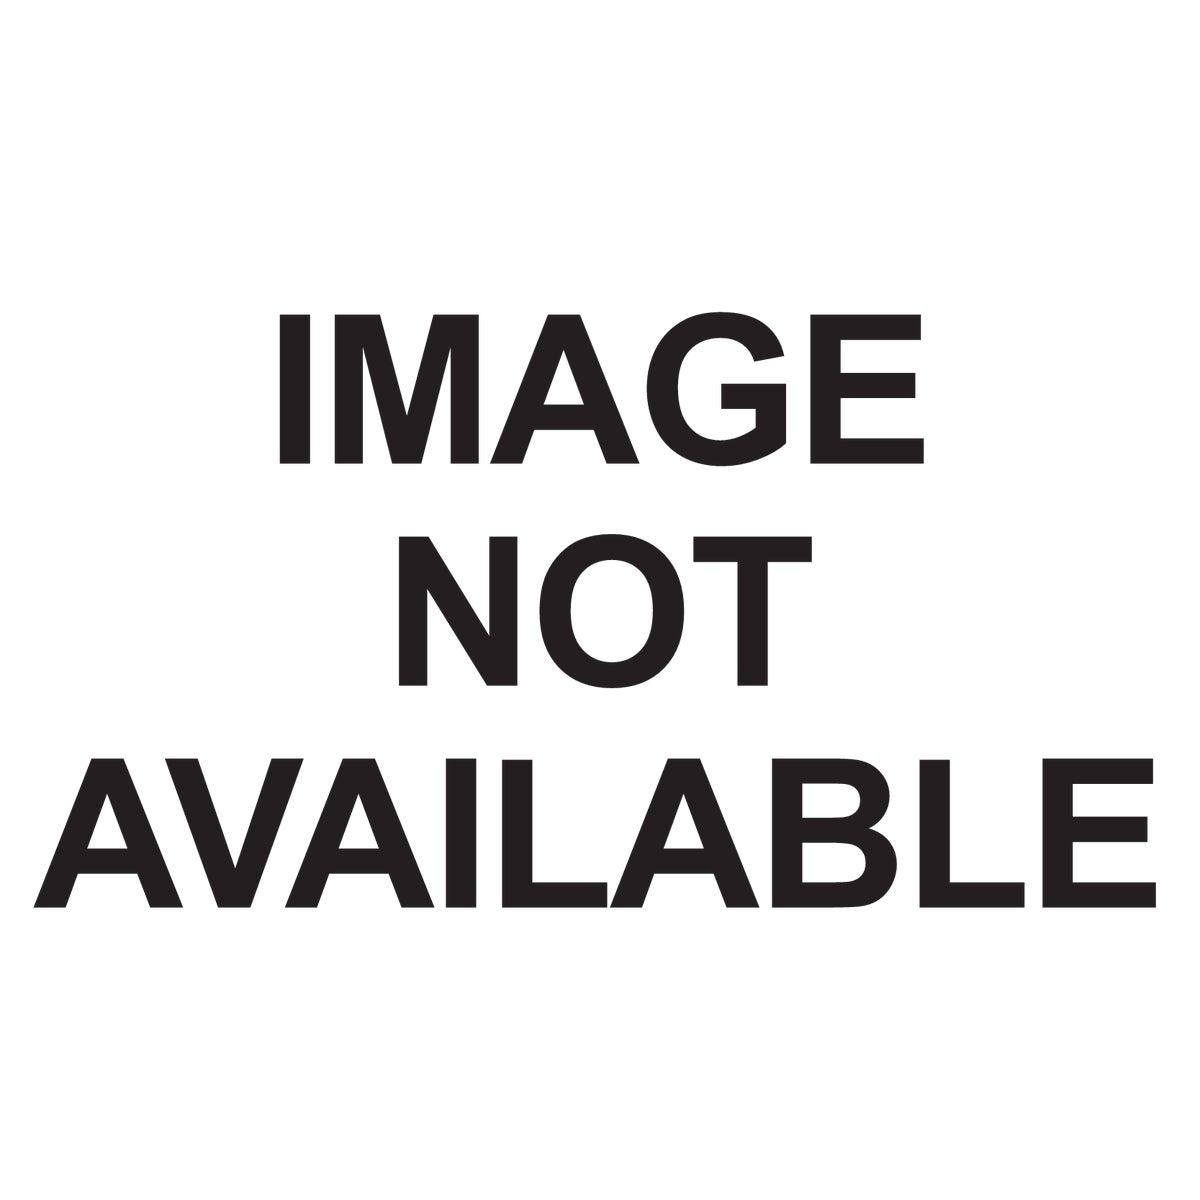 32X80 WHT FV STORM DOOR - 62CVIS132WH by Aluminart Prod Ltd